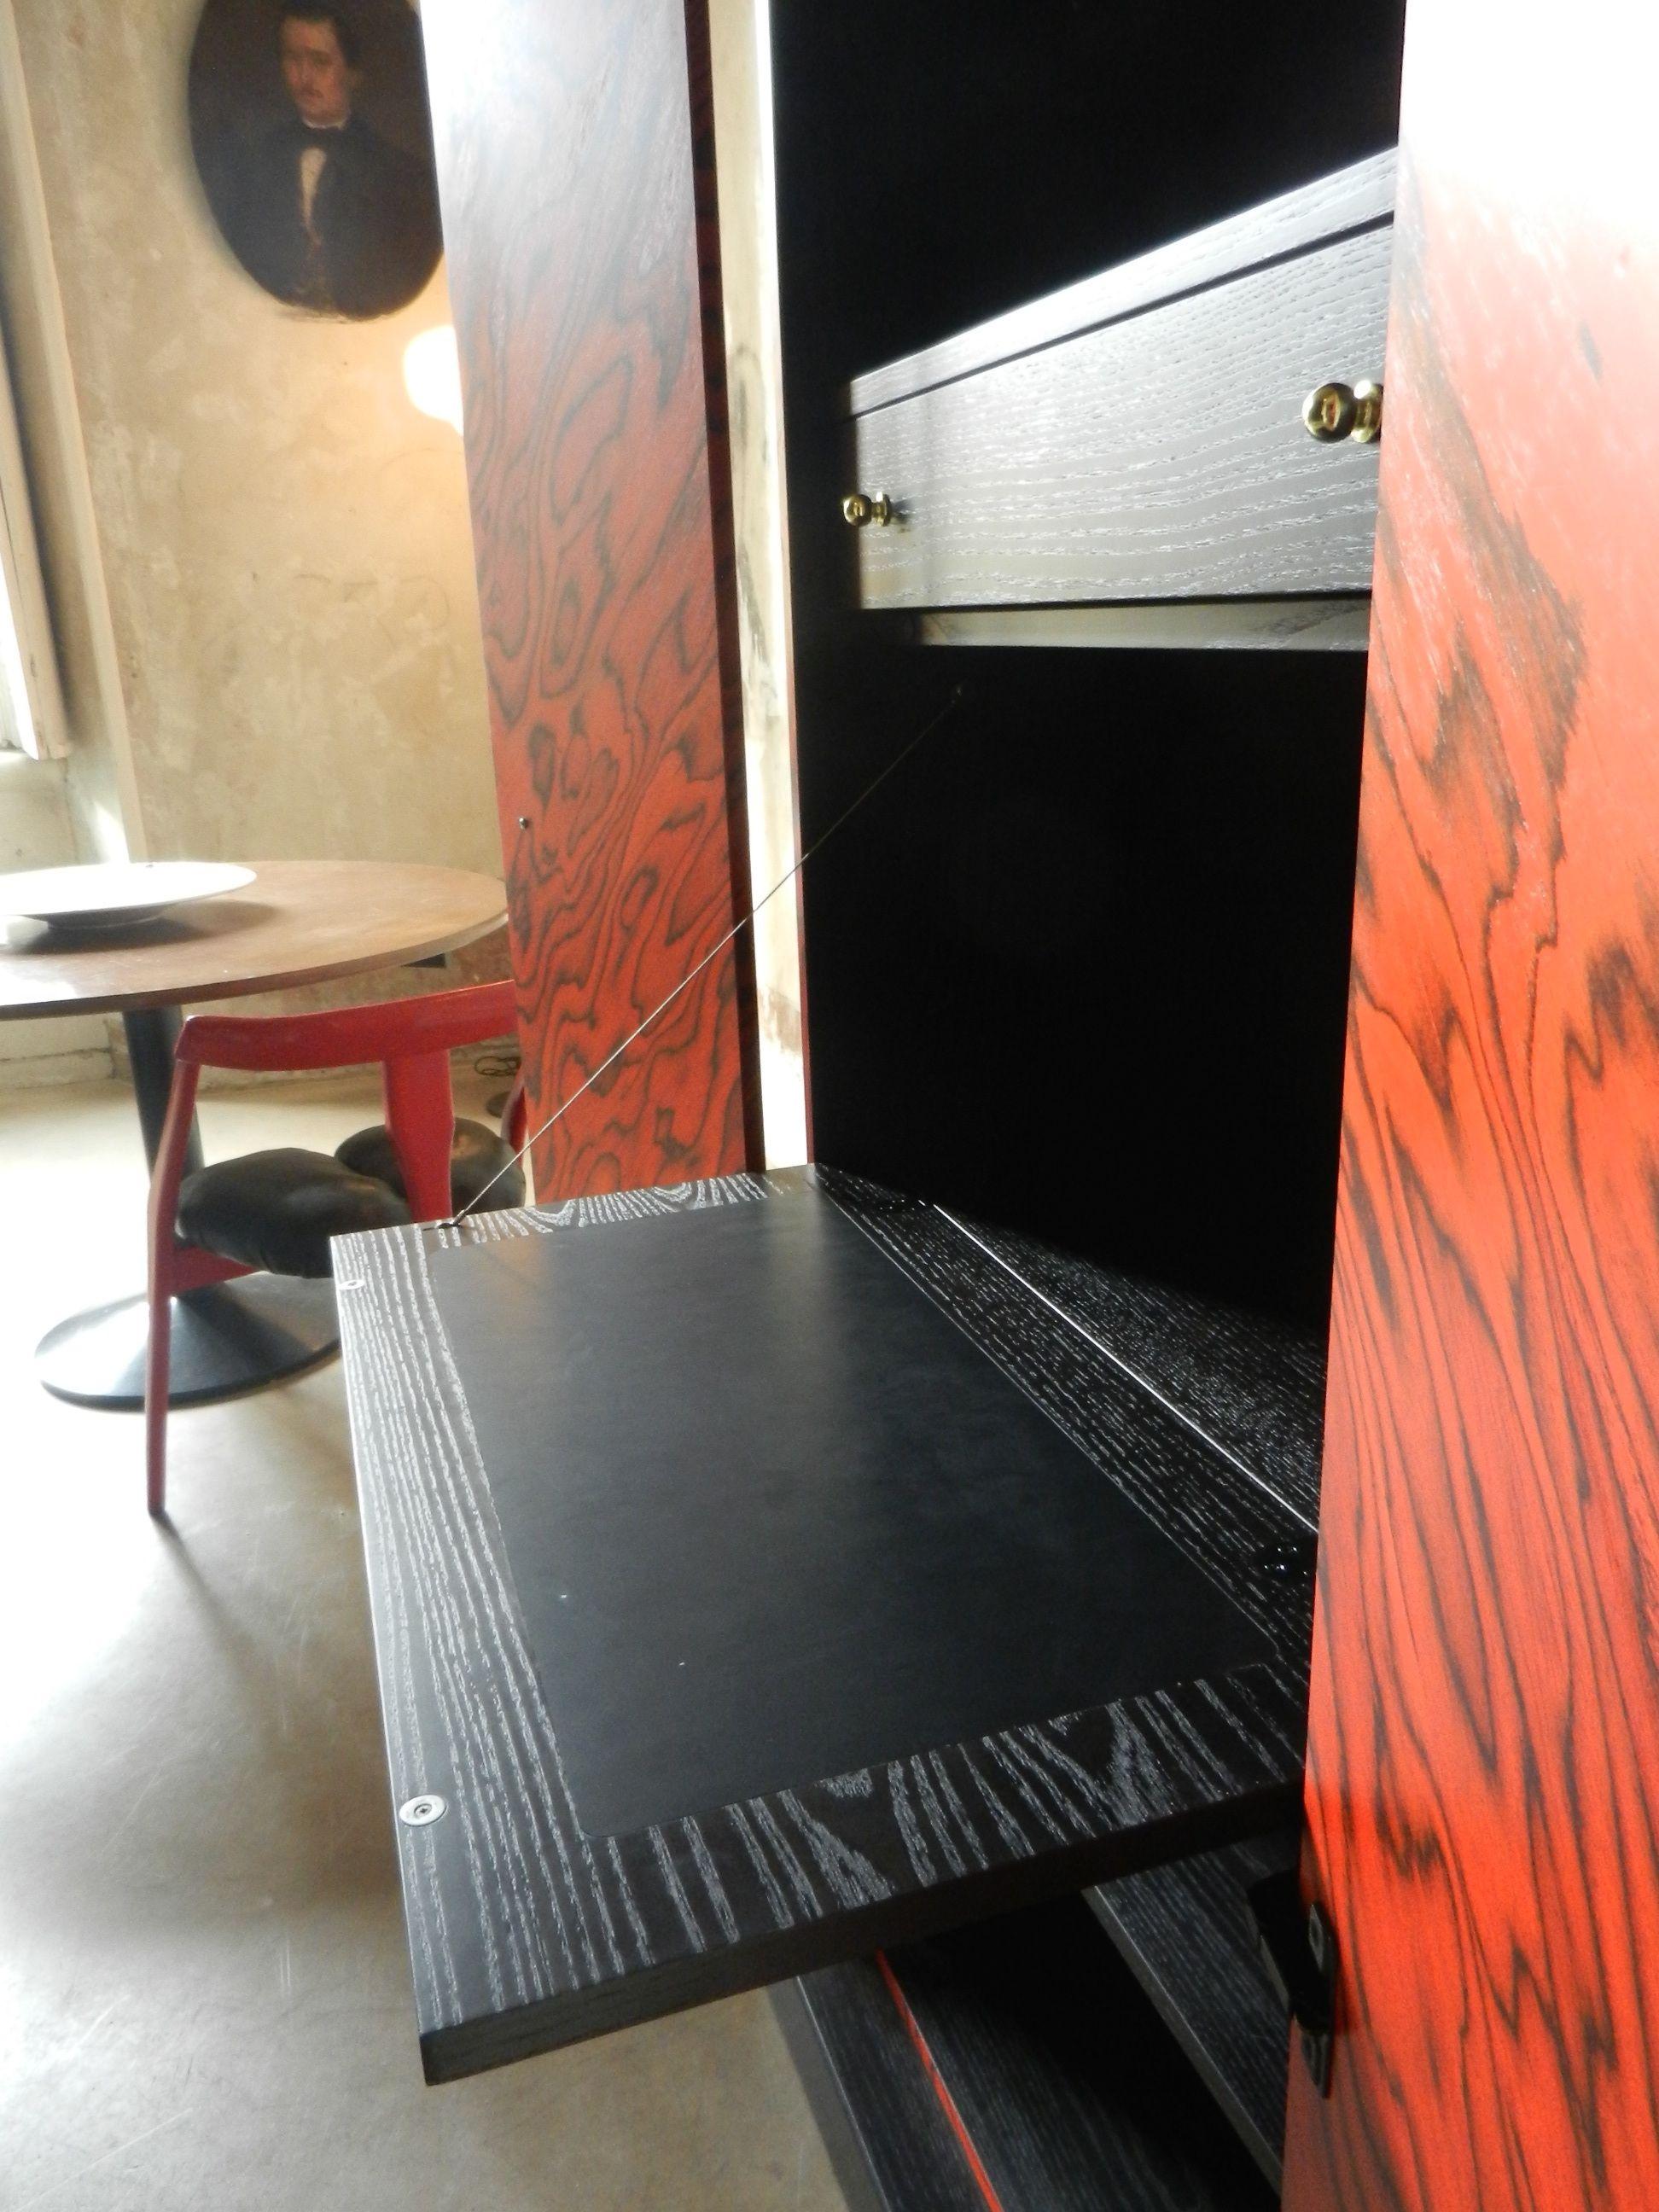 Ettore Sottsass, Nairobi,1989, Italy. #erastudioapartmentgallery #erastudio #deisgngallery #collectibledesign #design #gallery #milan #italy #ettoresottsass #wood #italiandesign #historicaldesign #interior #eighties #ambience #places #madeinitaly #furniture #details #cabinet #nairobi #memphis #memphisdesign #pattern #wood #lacquerwood #poltronova #drawer #zanotta